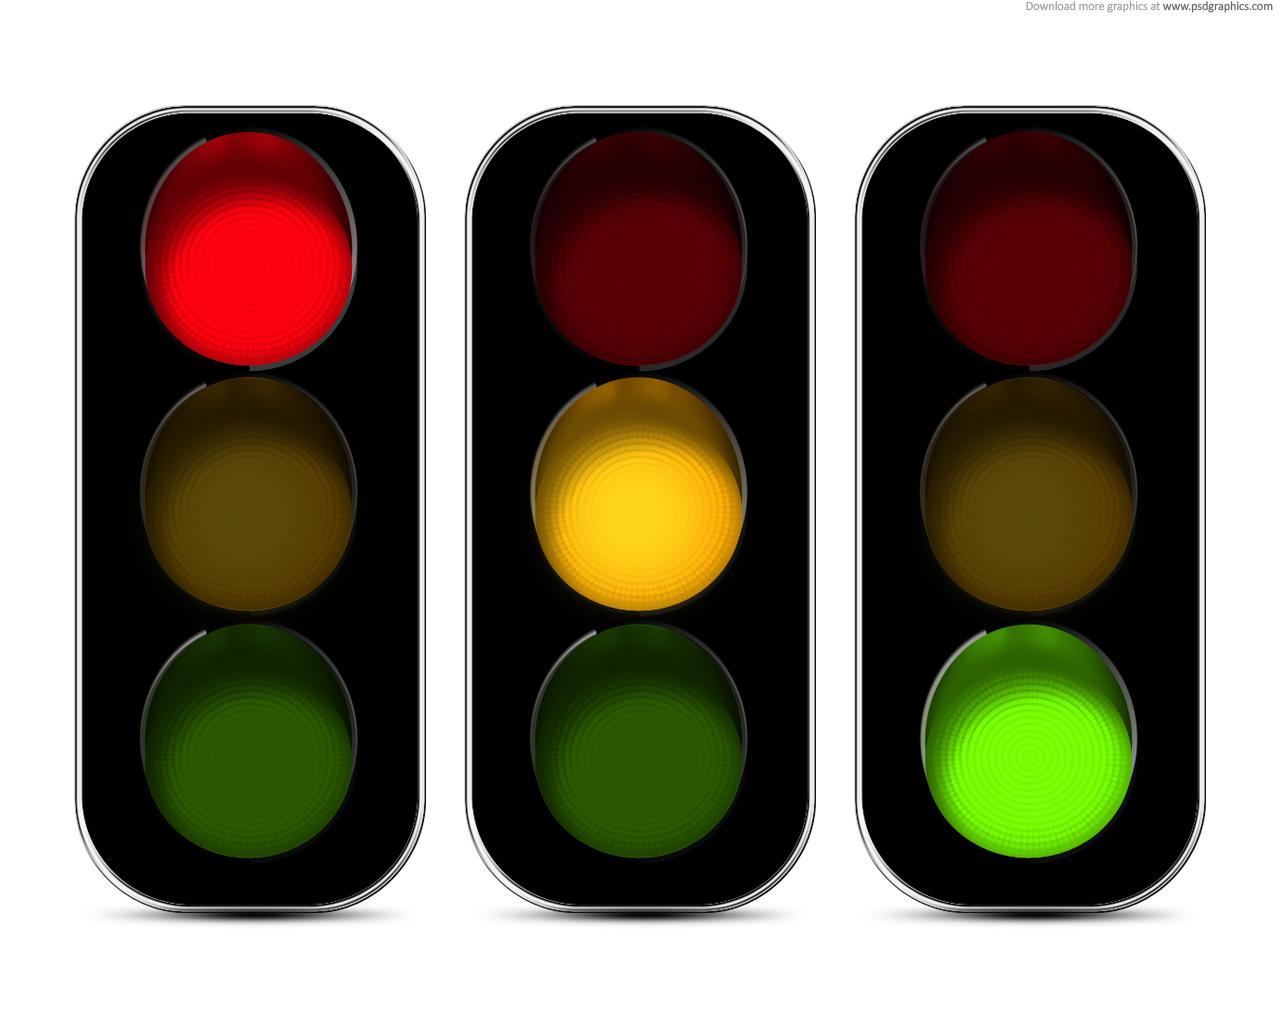 Traffic Lights Icon Psd Psdgraphics-Traffic Lights Icon Psd Psdgraphics-11